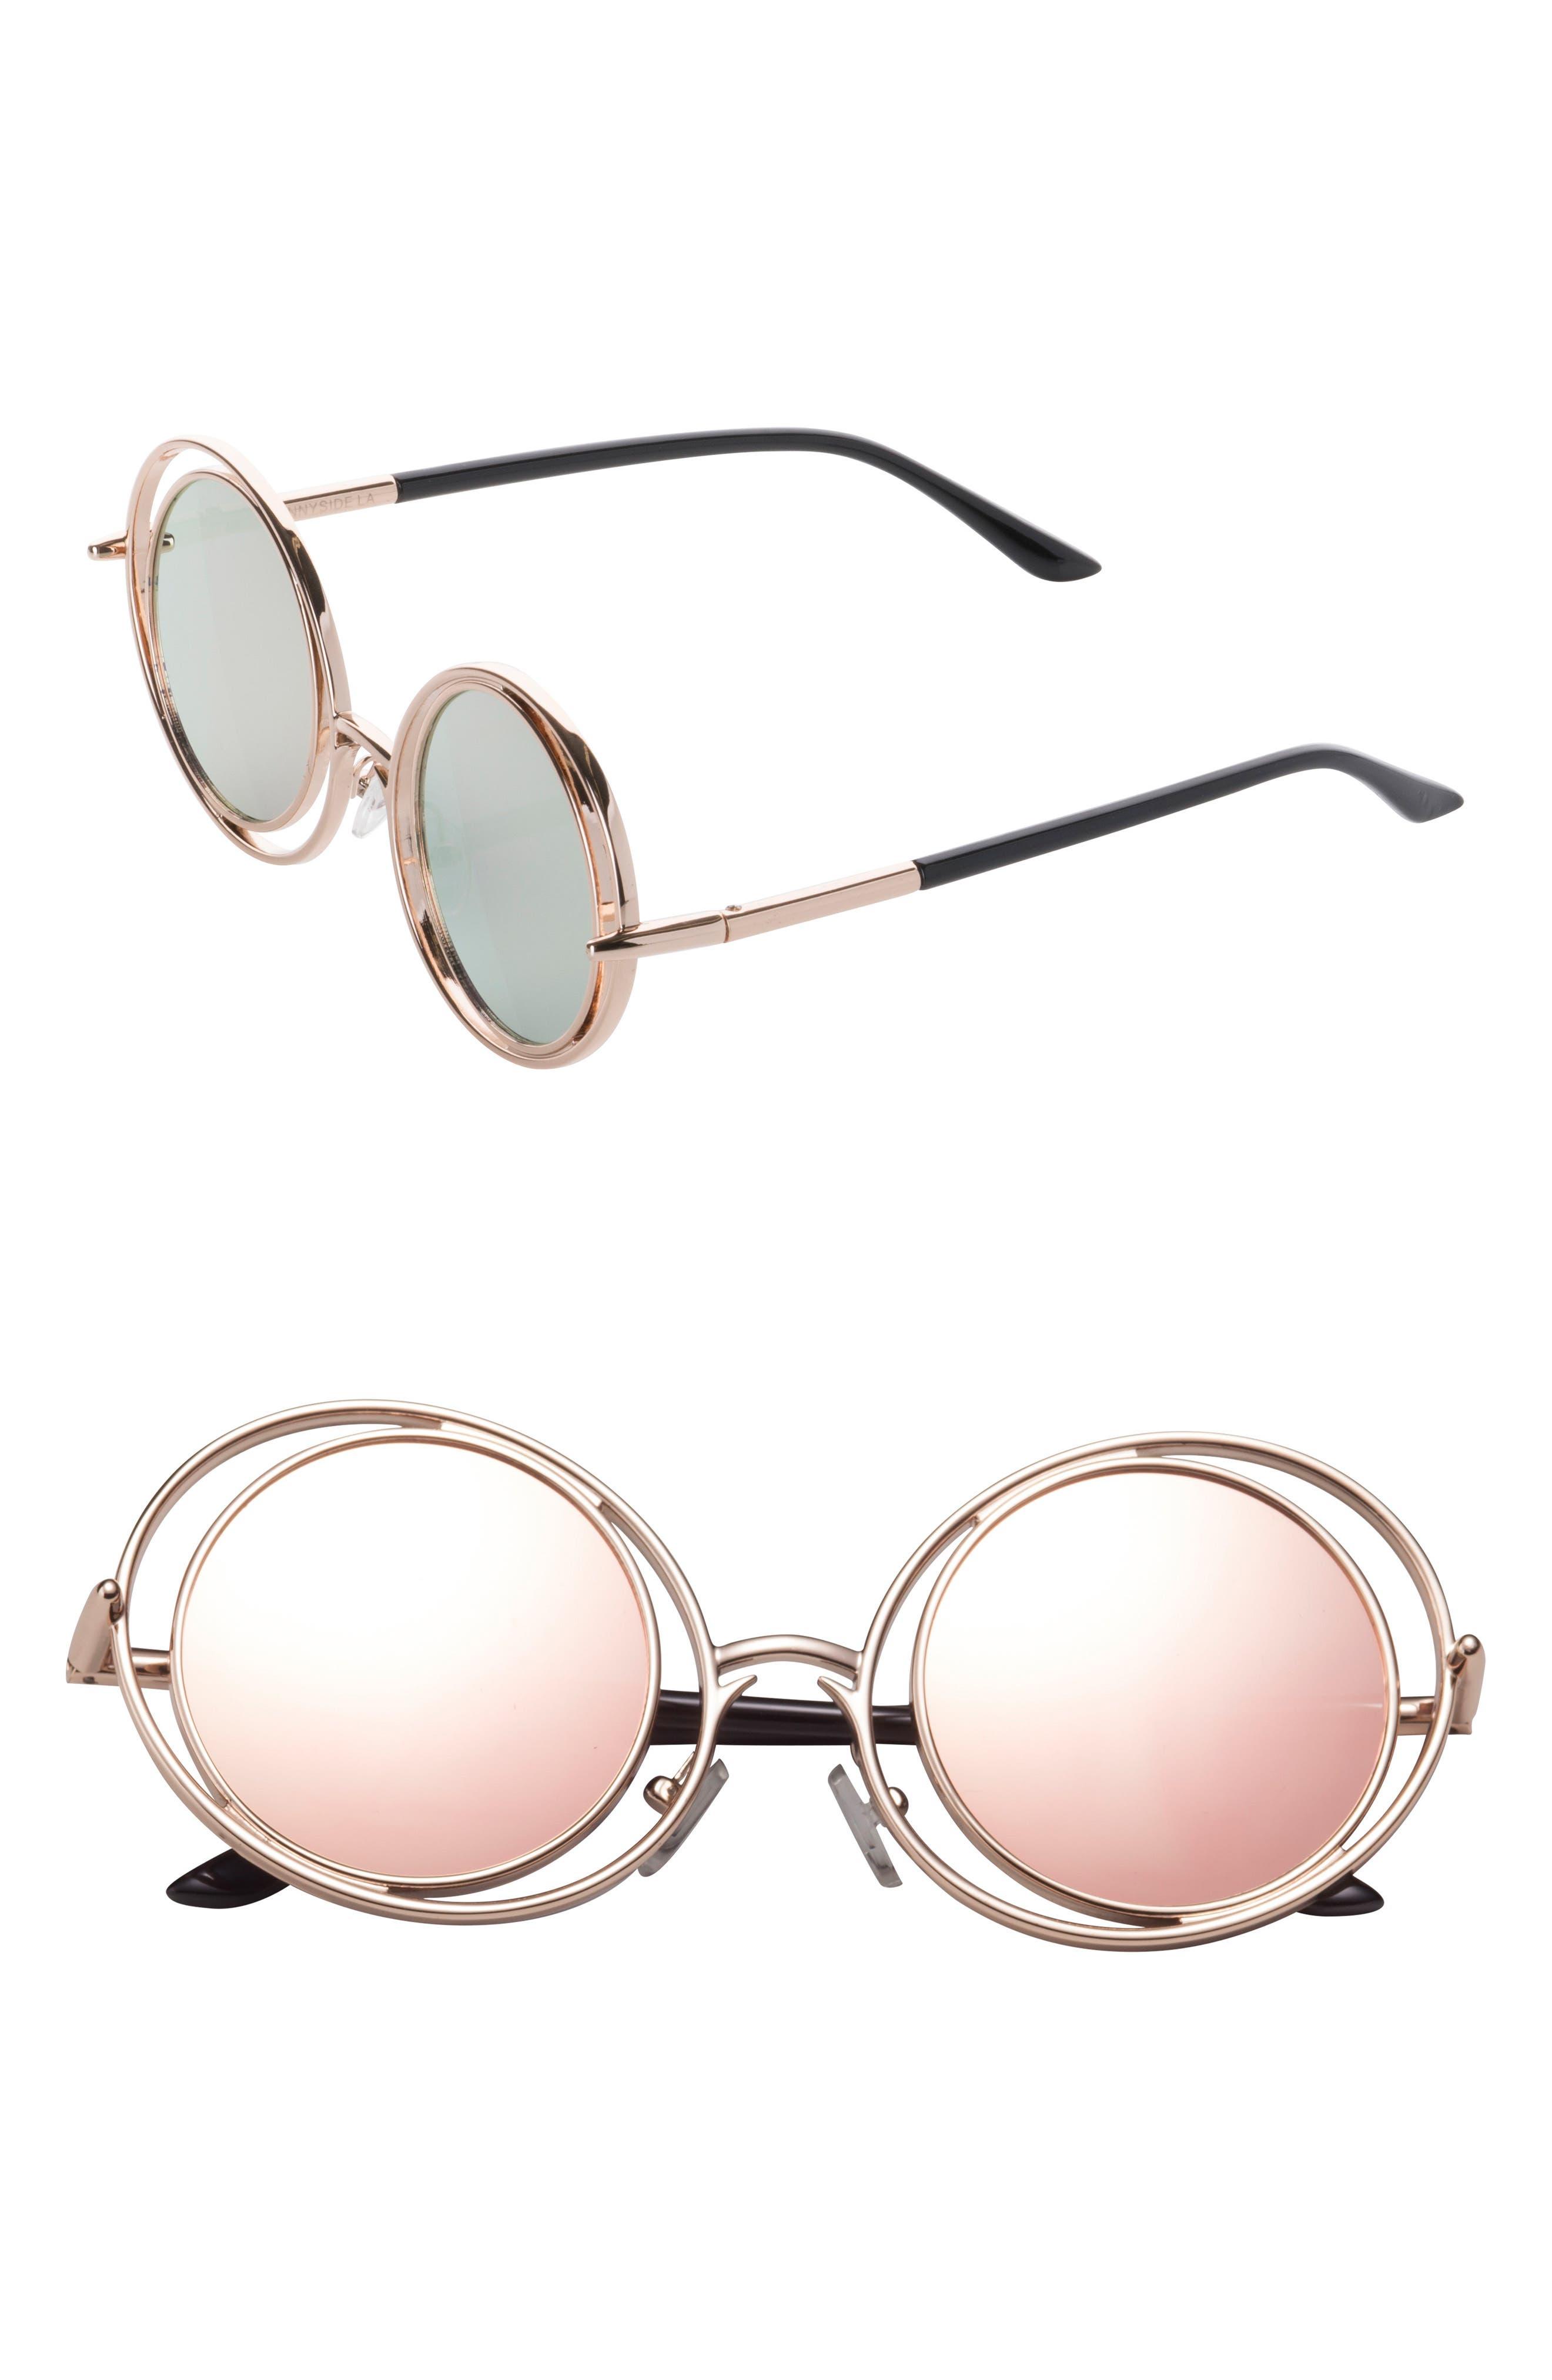 SUNNYSIDE LA 55mm Round Sunglasses, Main, color, 650